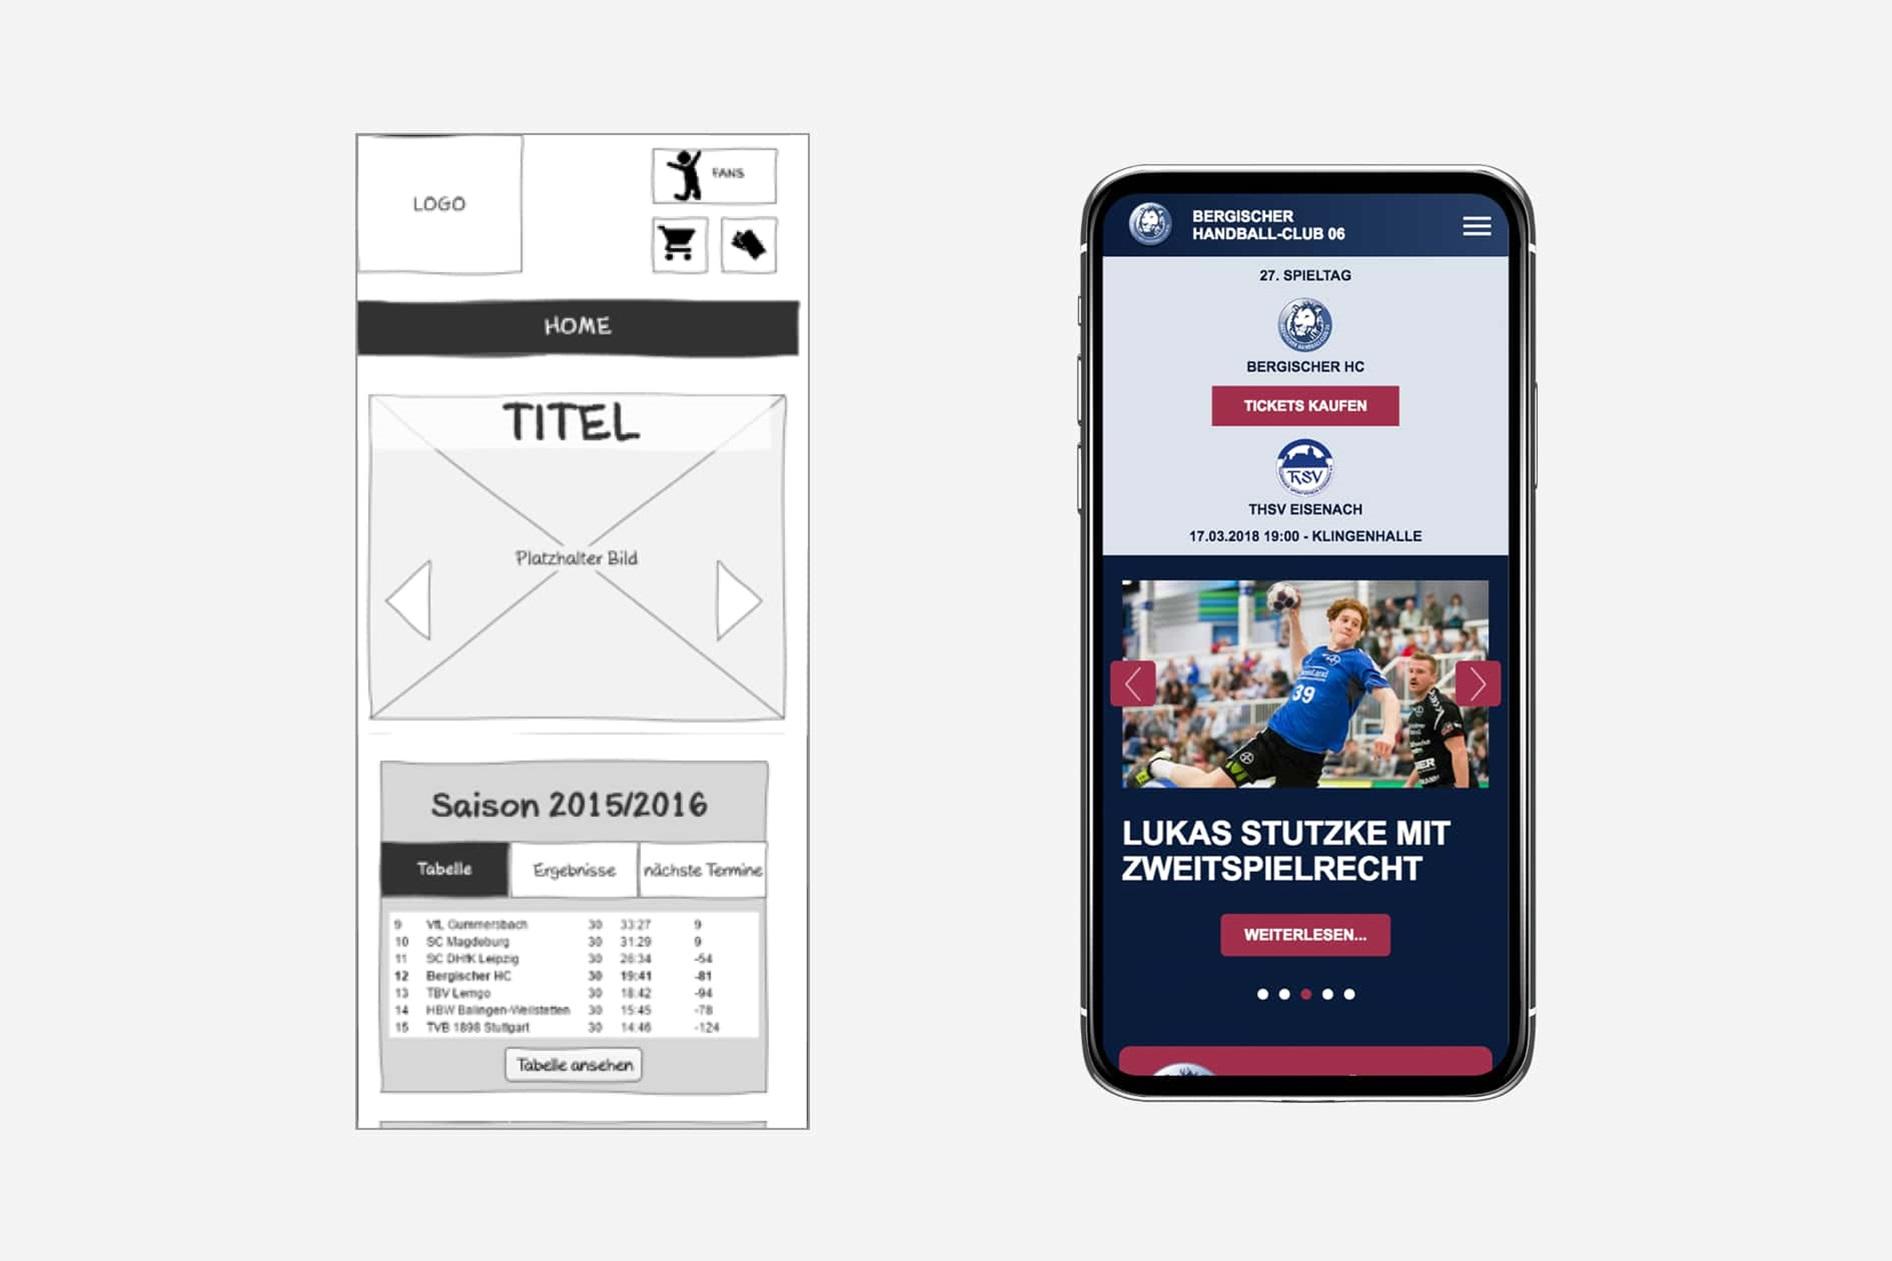 Bergischer Handballclub (BHC) - Smartphone